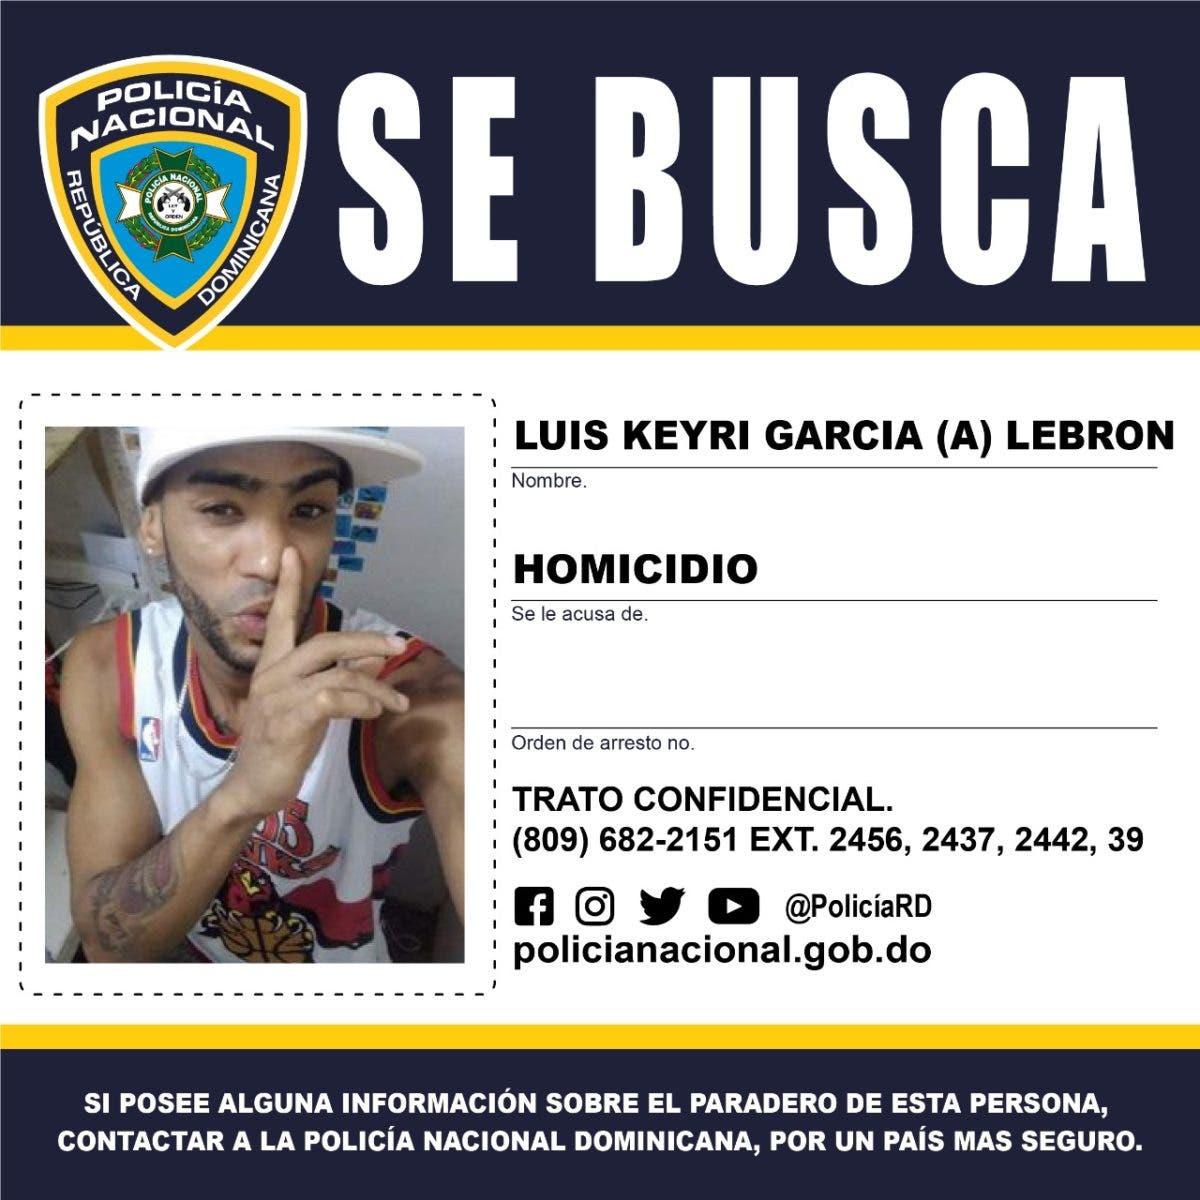 Apresan hombre acusado de matar mujer durante asalto a banca de lotería en Santiago